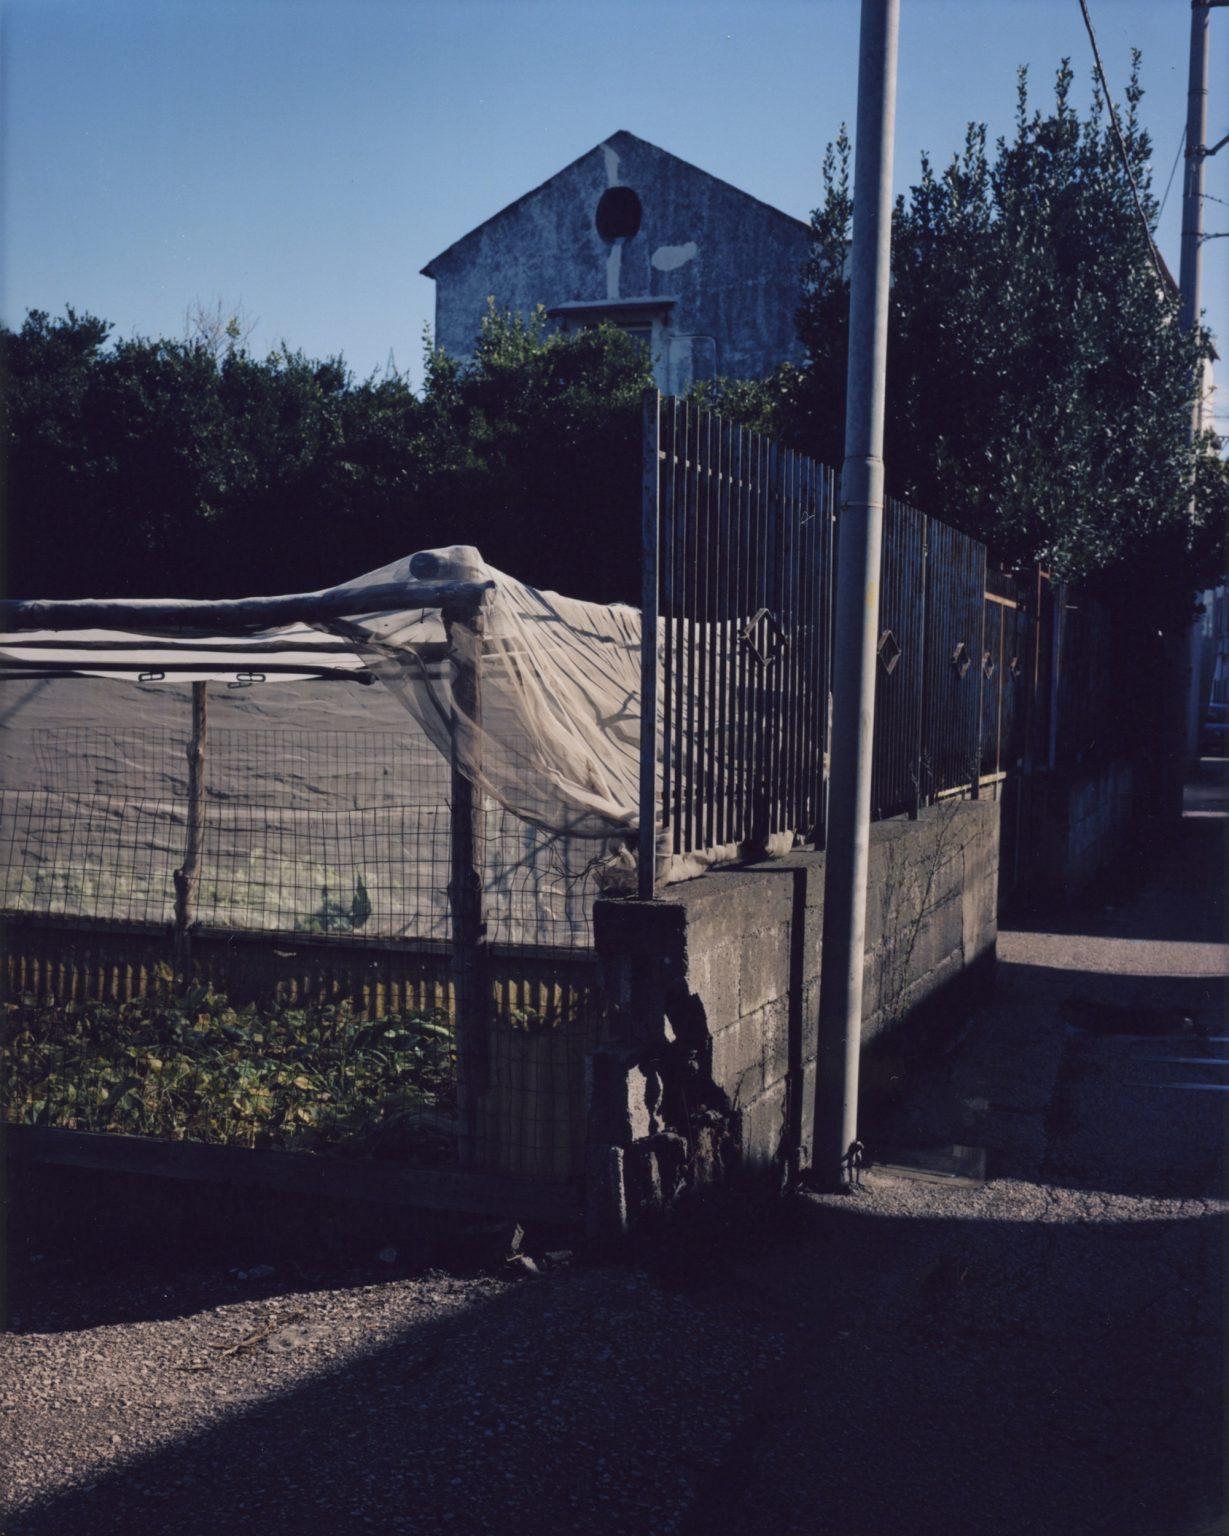 Small corner dedicated to a vegetable garden. Peasi Vesuviani, Province of Naples. 2020